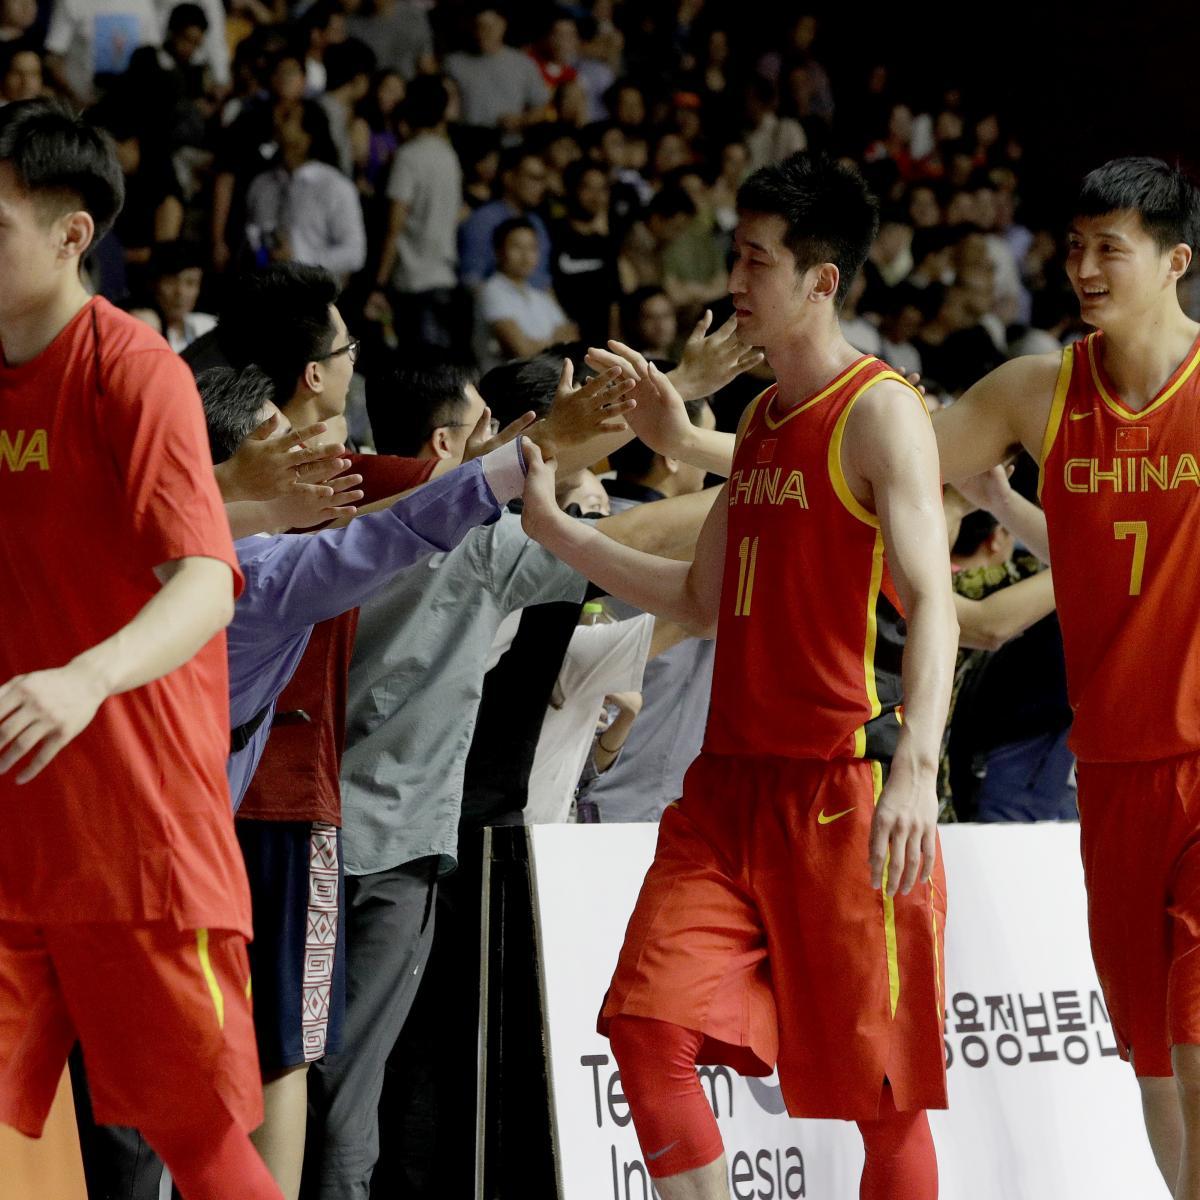 Asian Games 2018 Final: China vs. Iran Live Stream, Preview